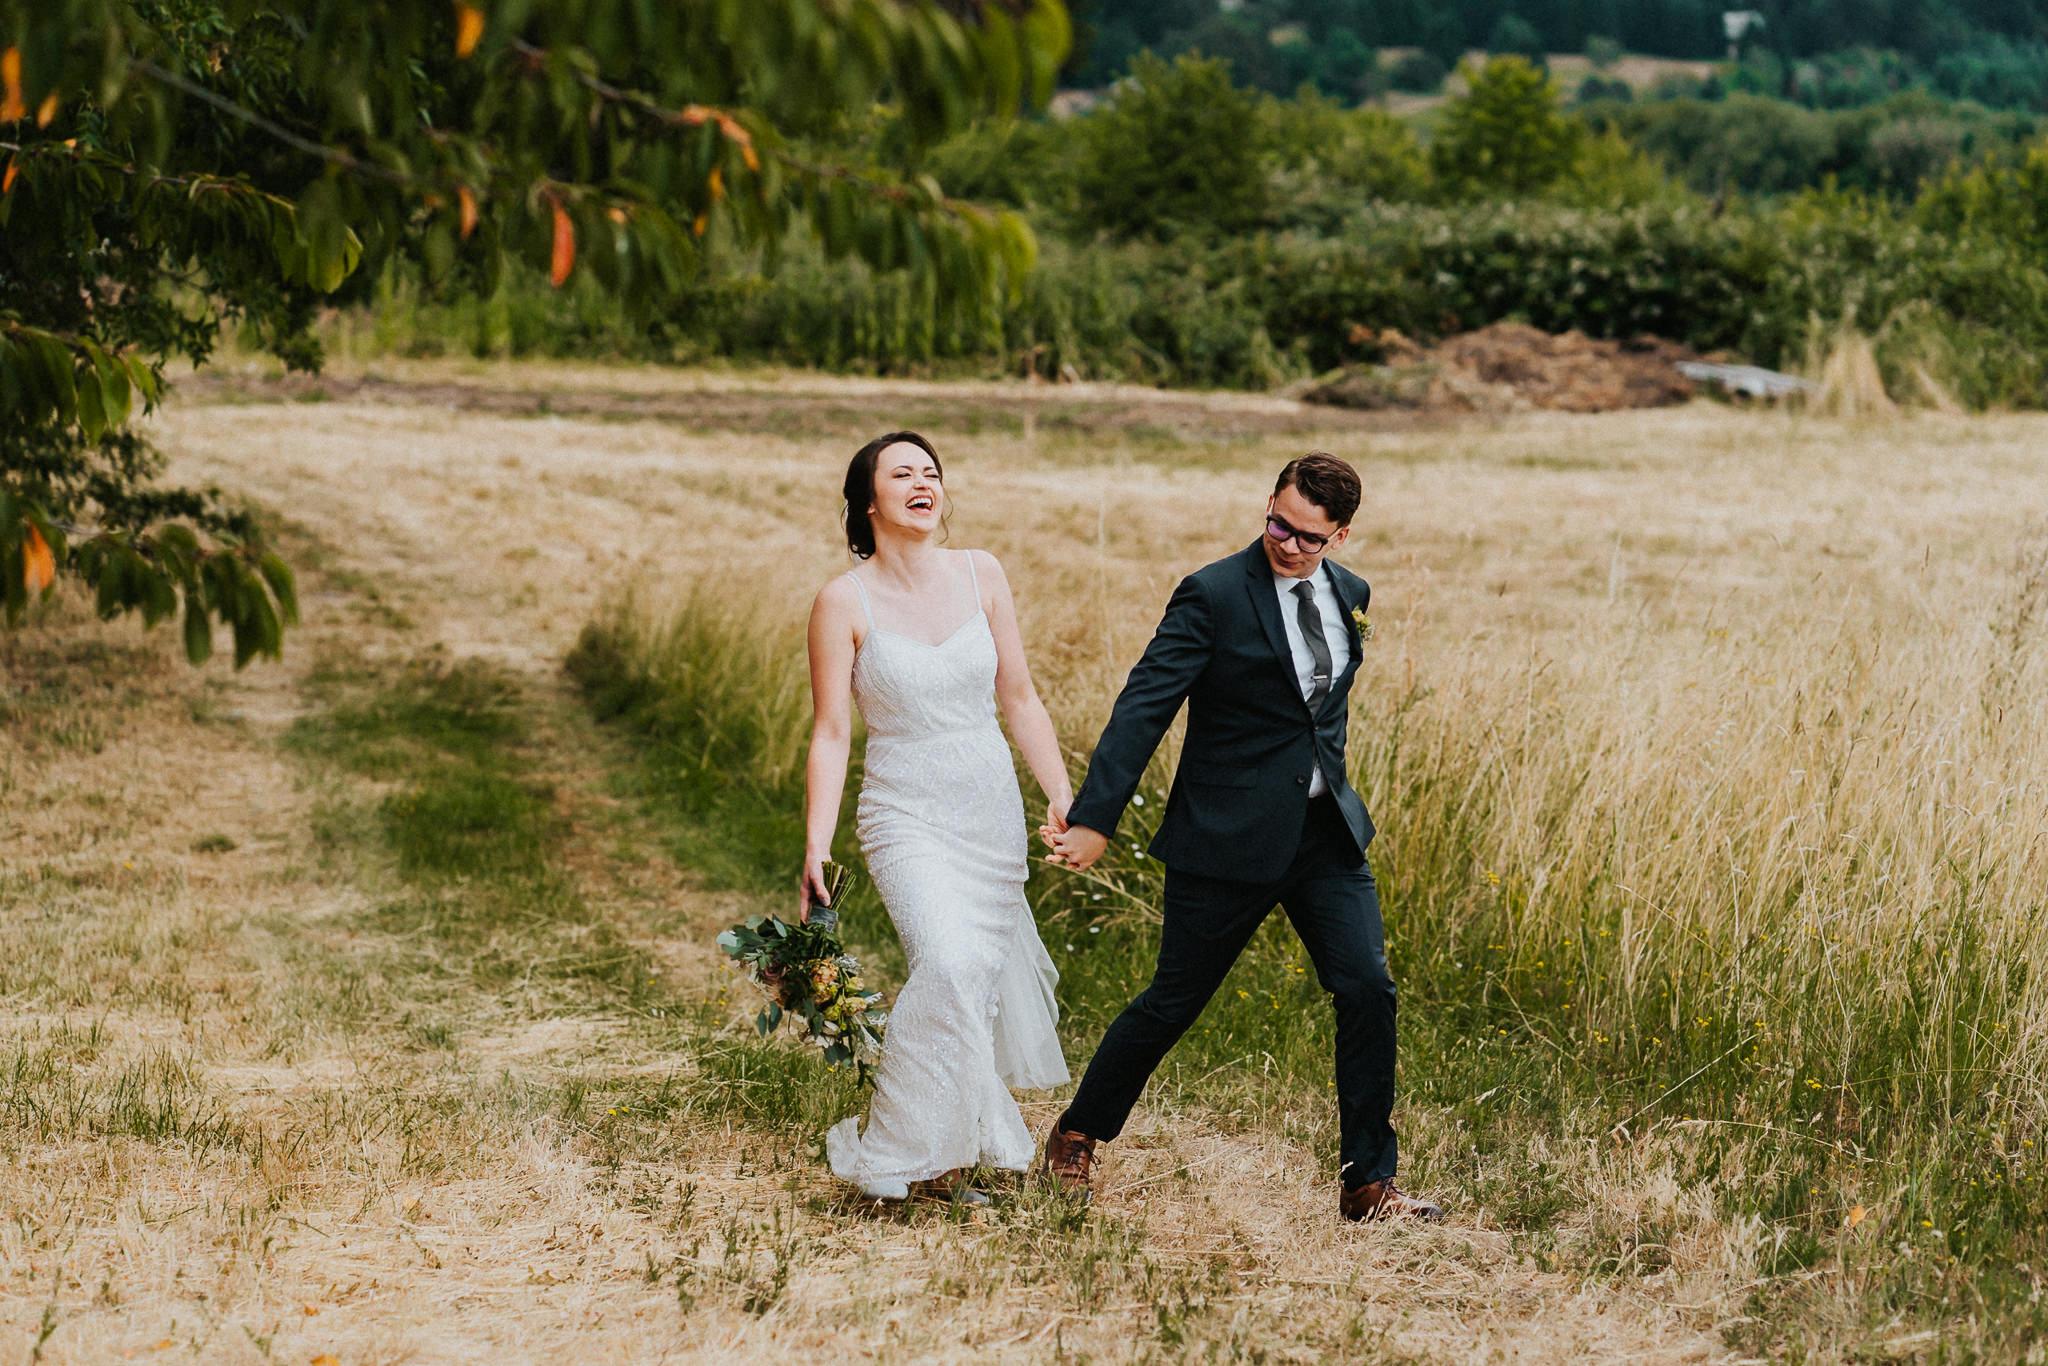 Water-Oasis-Portland-Wedding-Best-Photography-Alfred-Tang-32.jpg